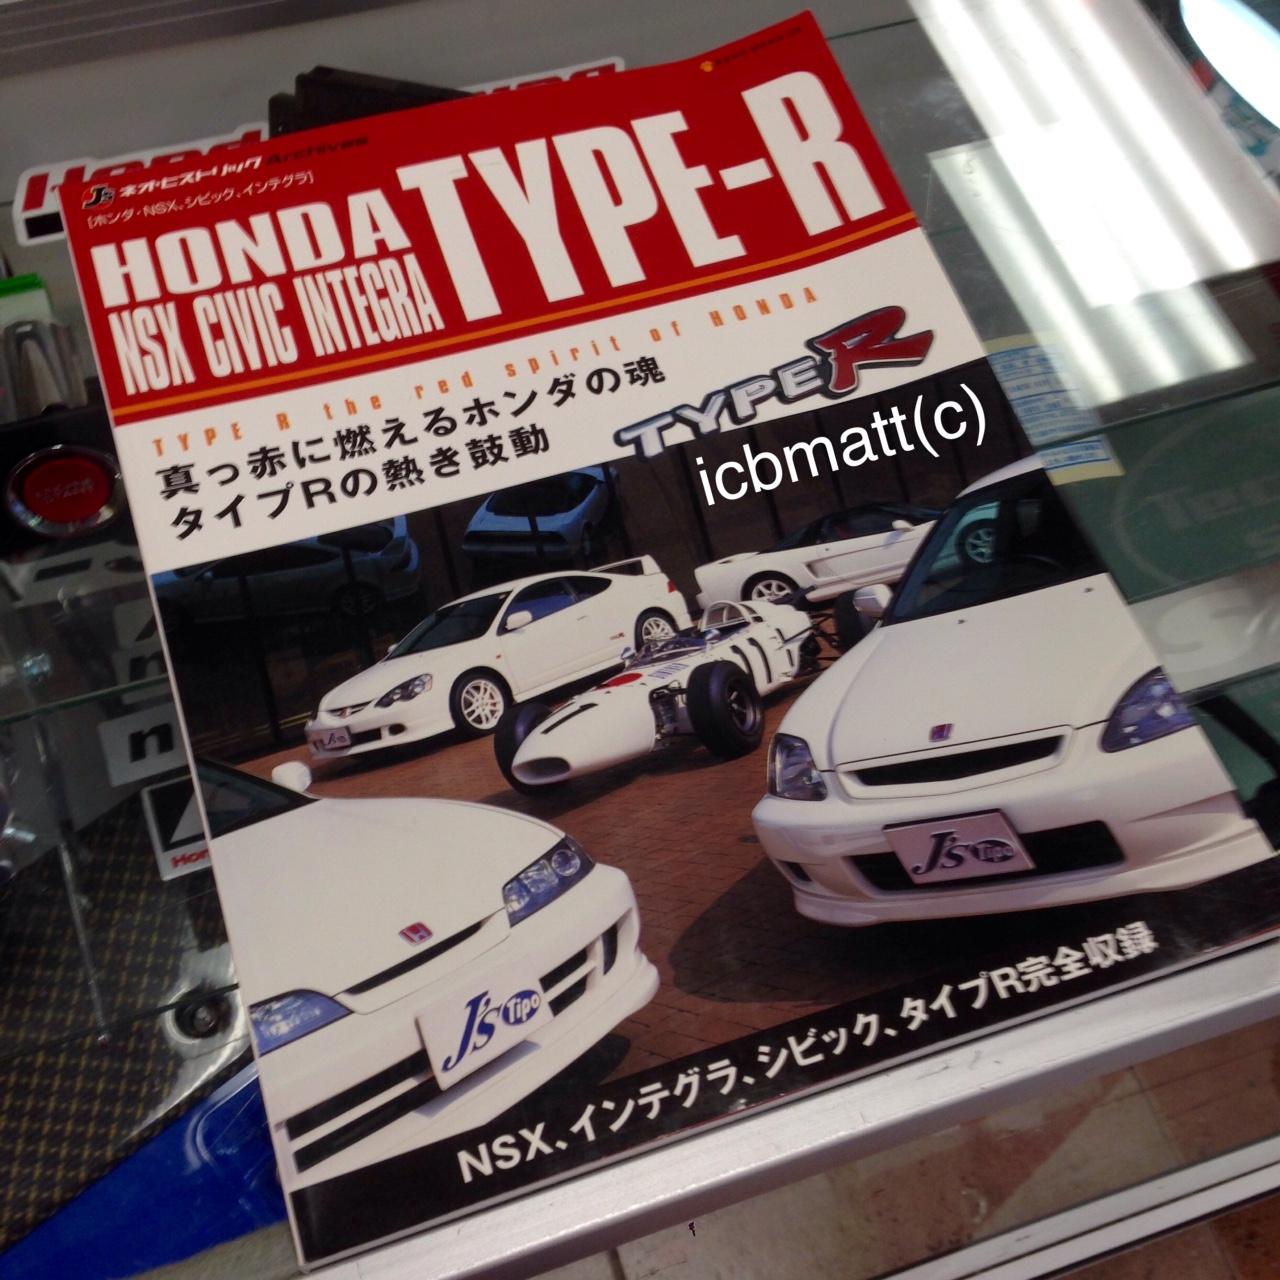 HONDA TYPE-R the red sprit of HONDA NSX CIVIC INTEGRA